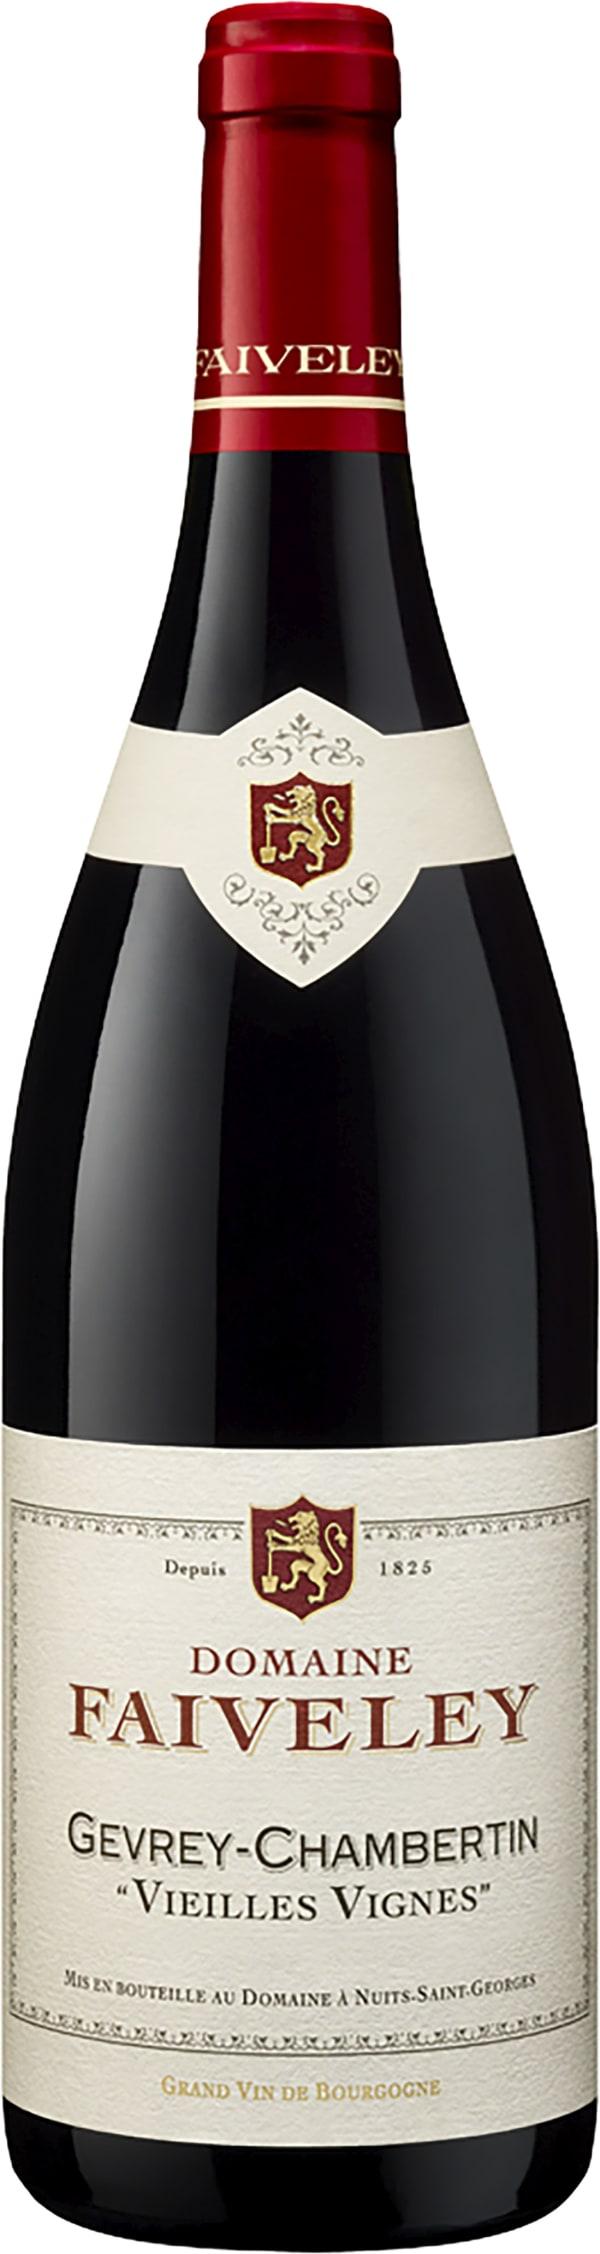 Domaine Faiveley Gevrey-Chambertin Vieilles Vignes 2017